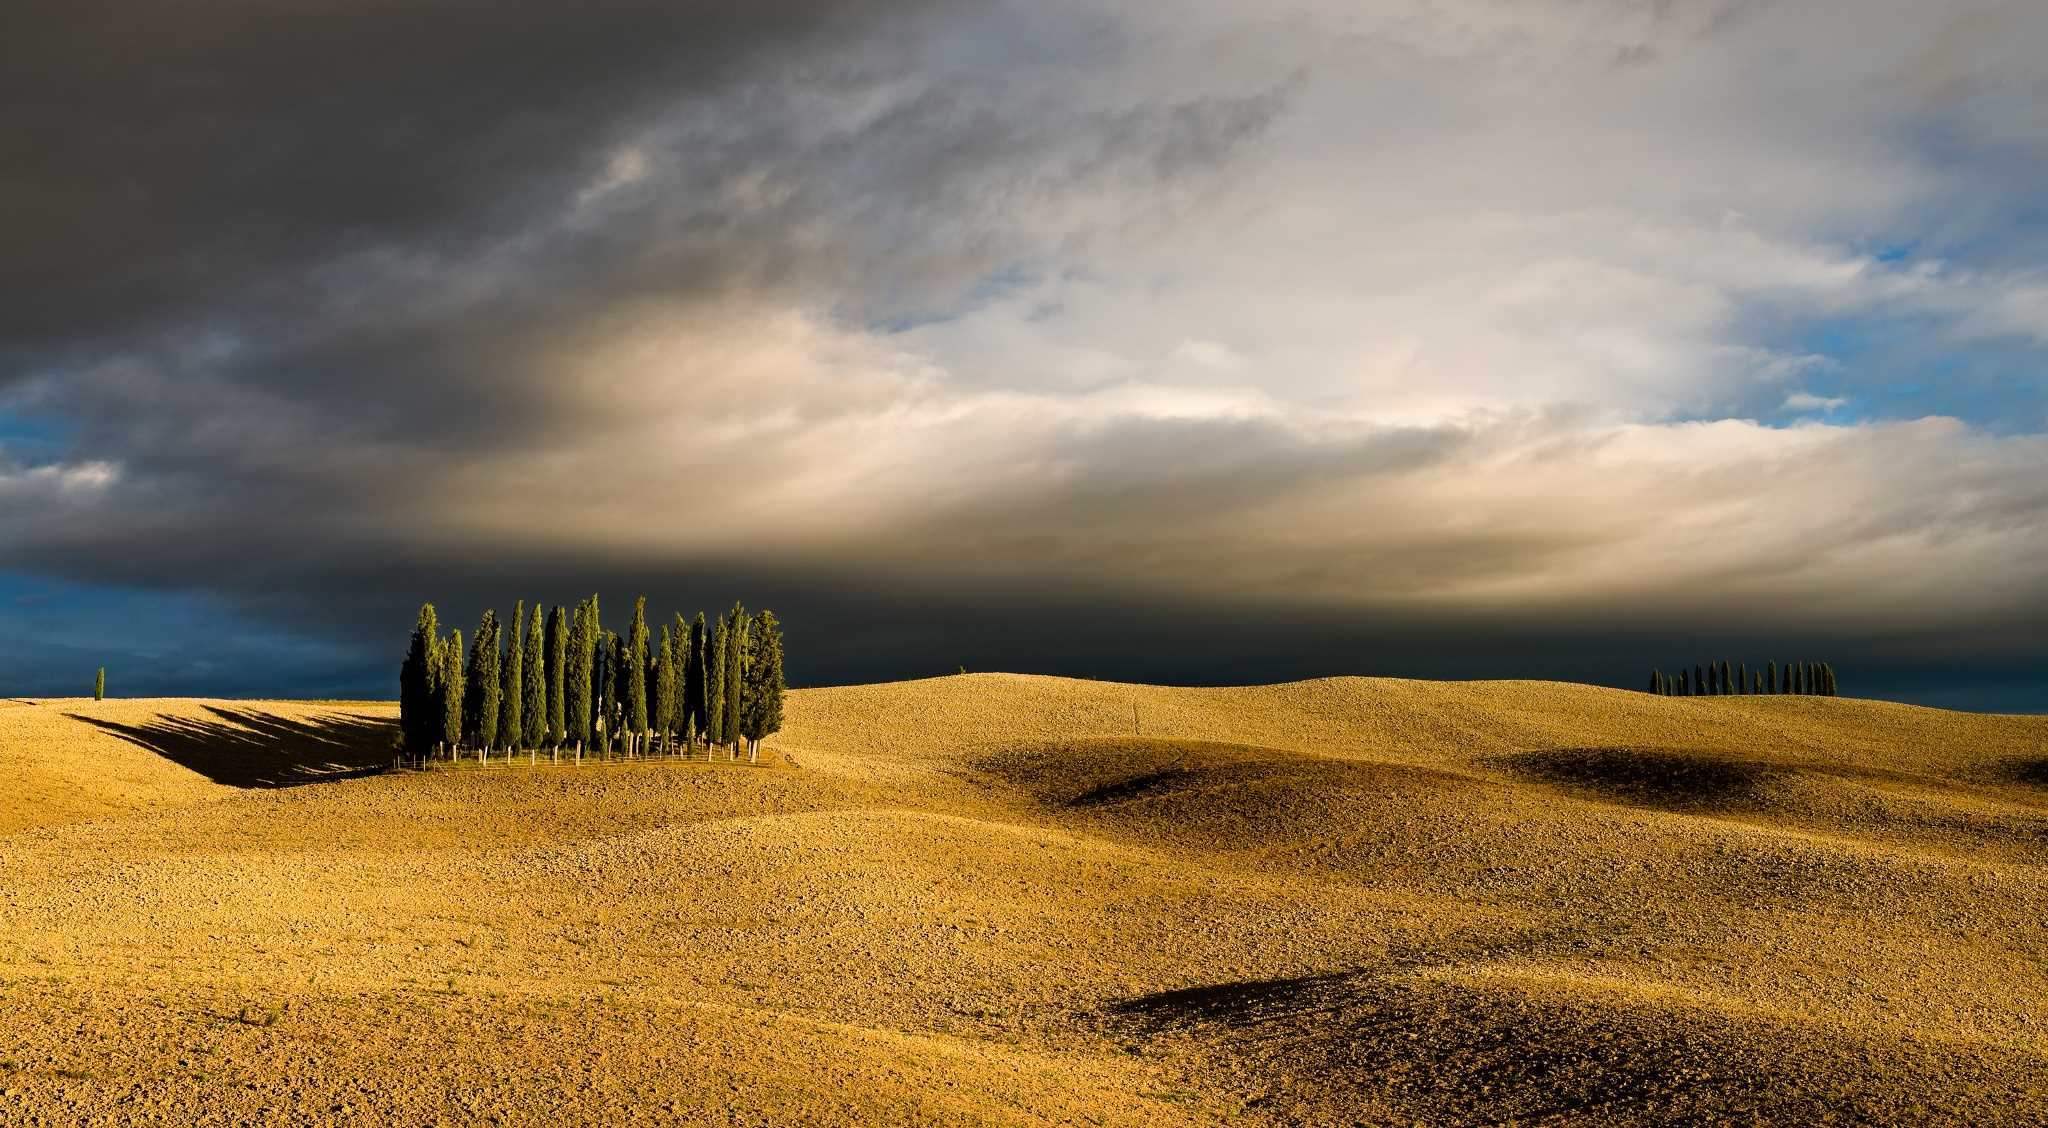 Landscape Photography by Daniel Bosma